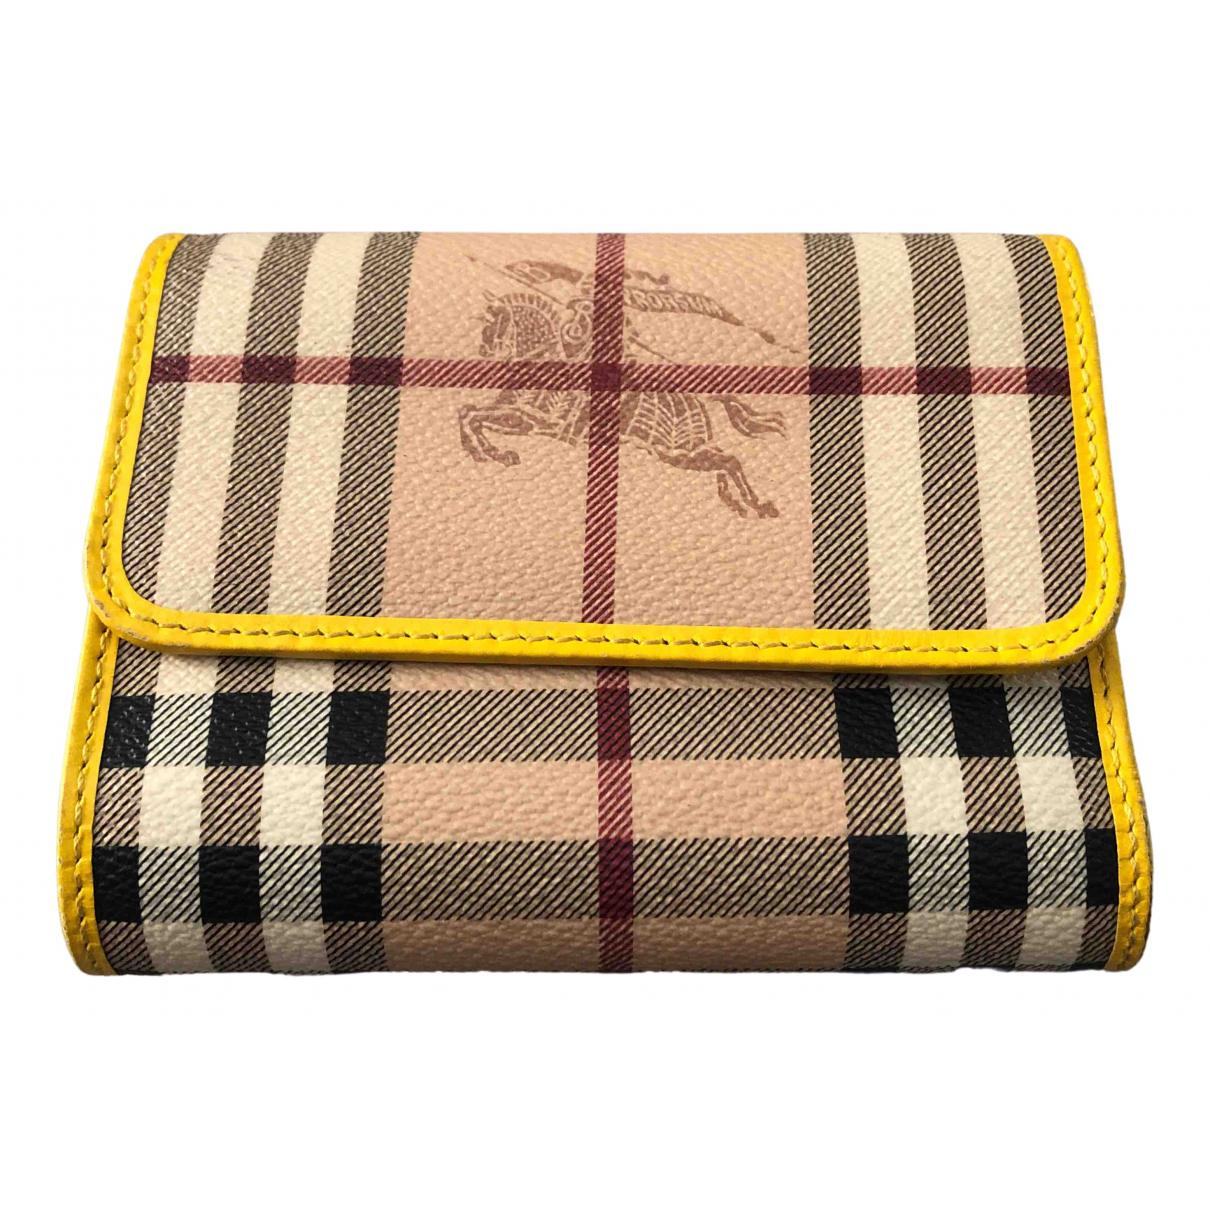 Burberry N Beige Cloth wallet for Women N